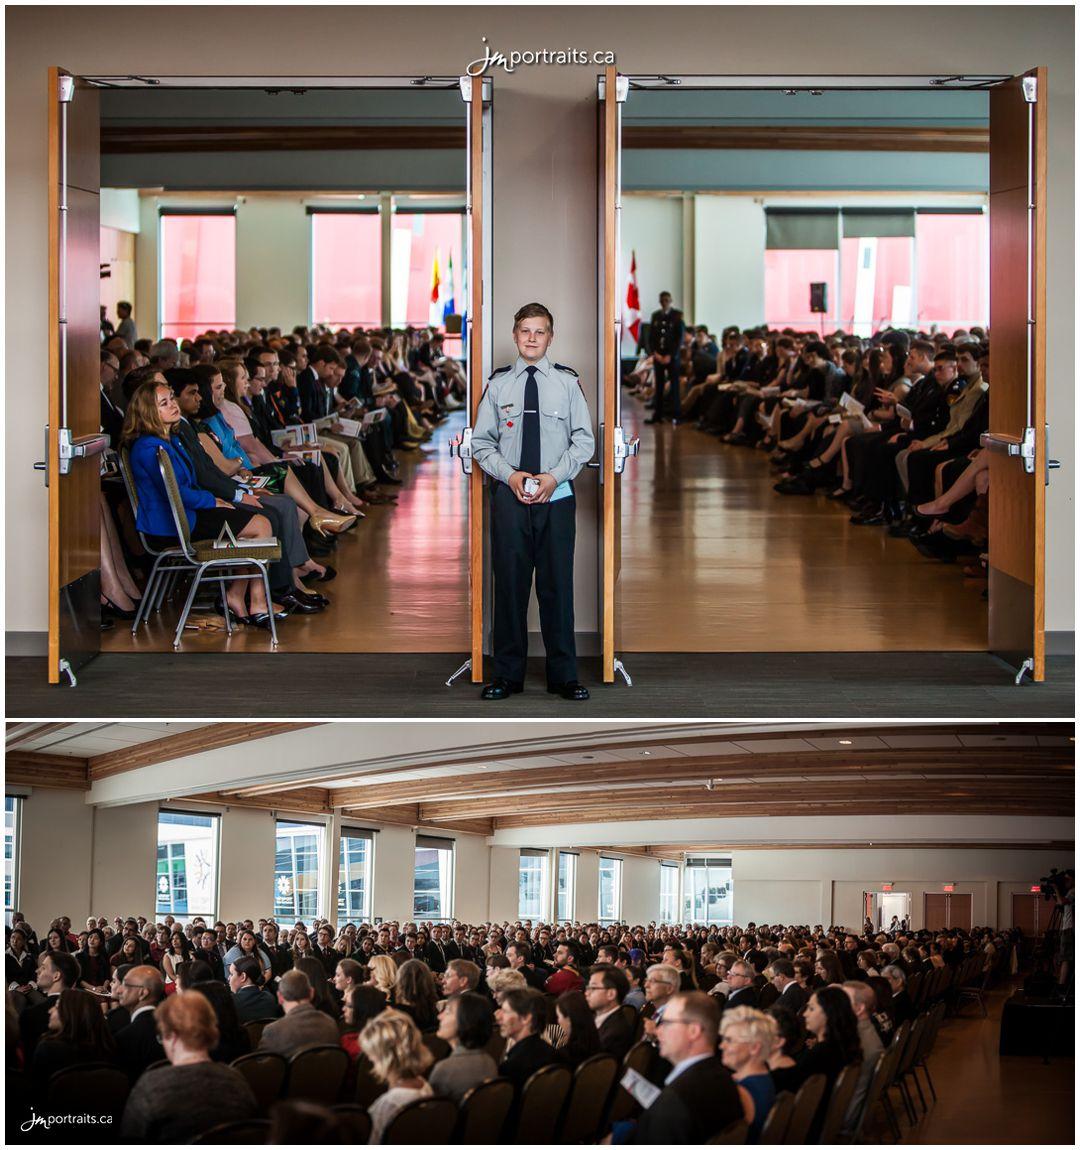 160624_06-The-Duke-of-Edinburgh-Award-Ceremony-WinSport